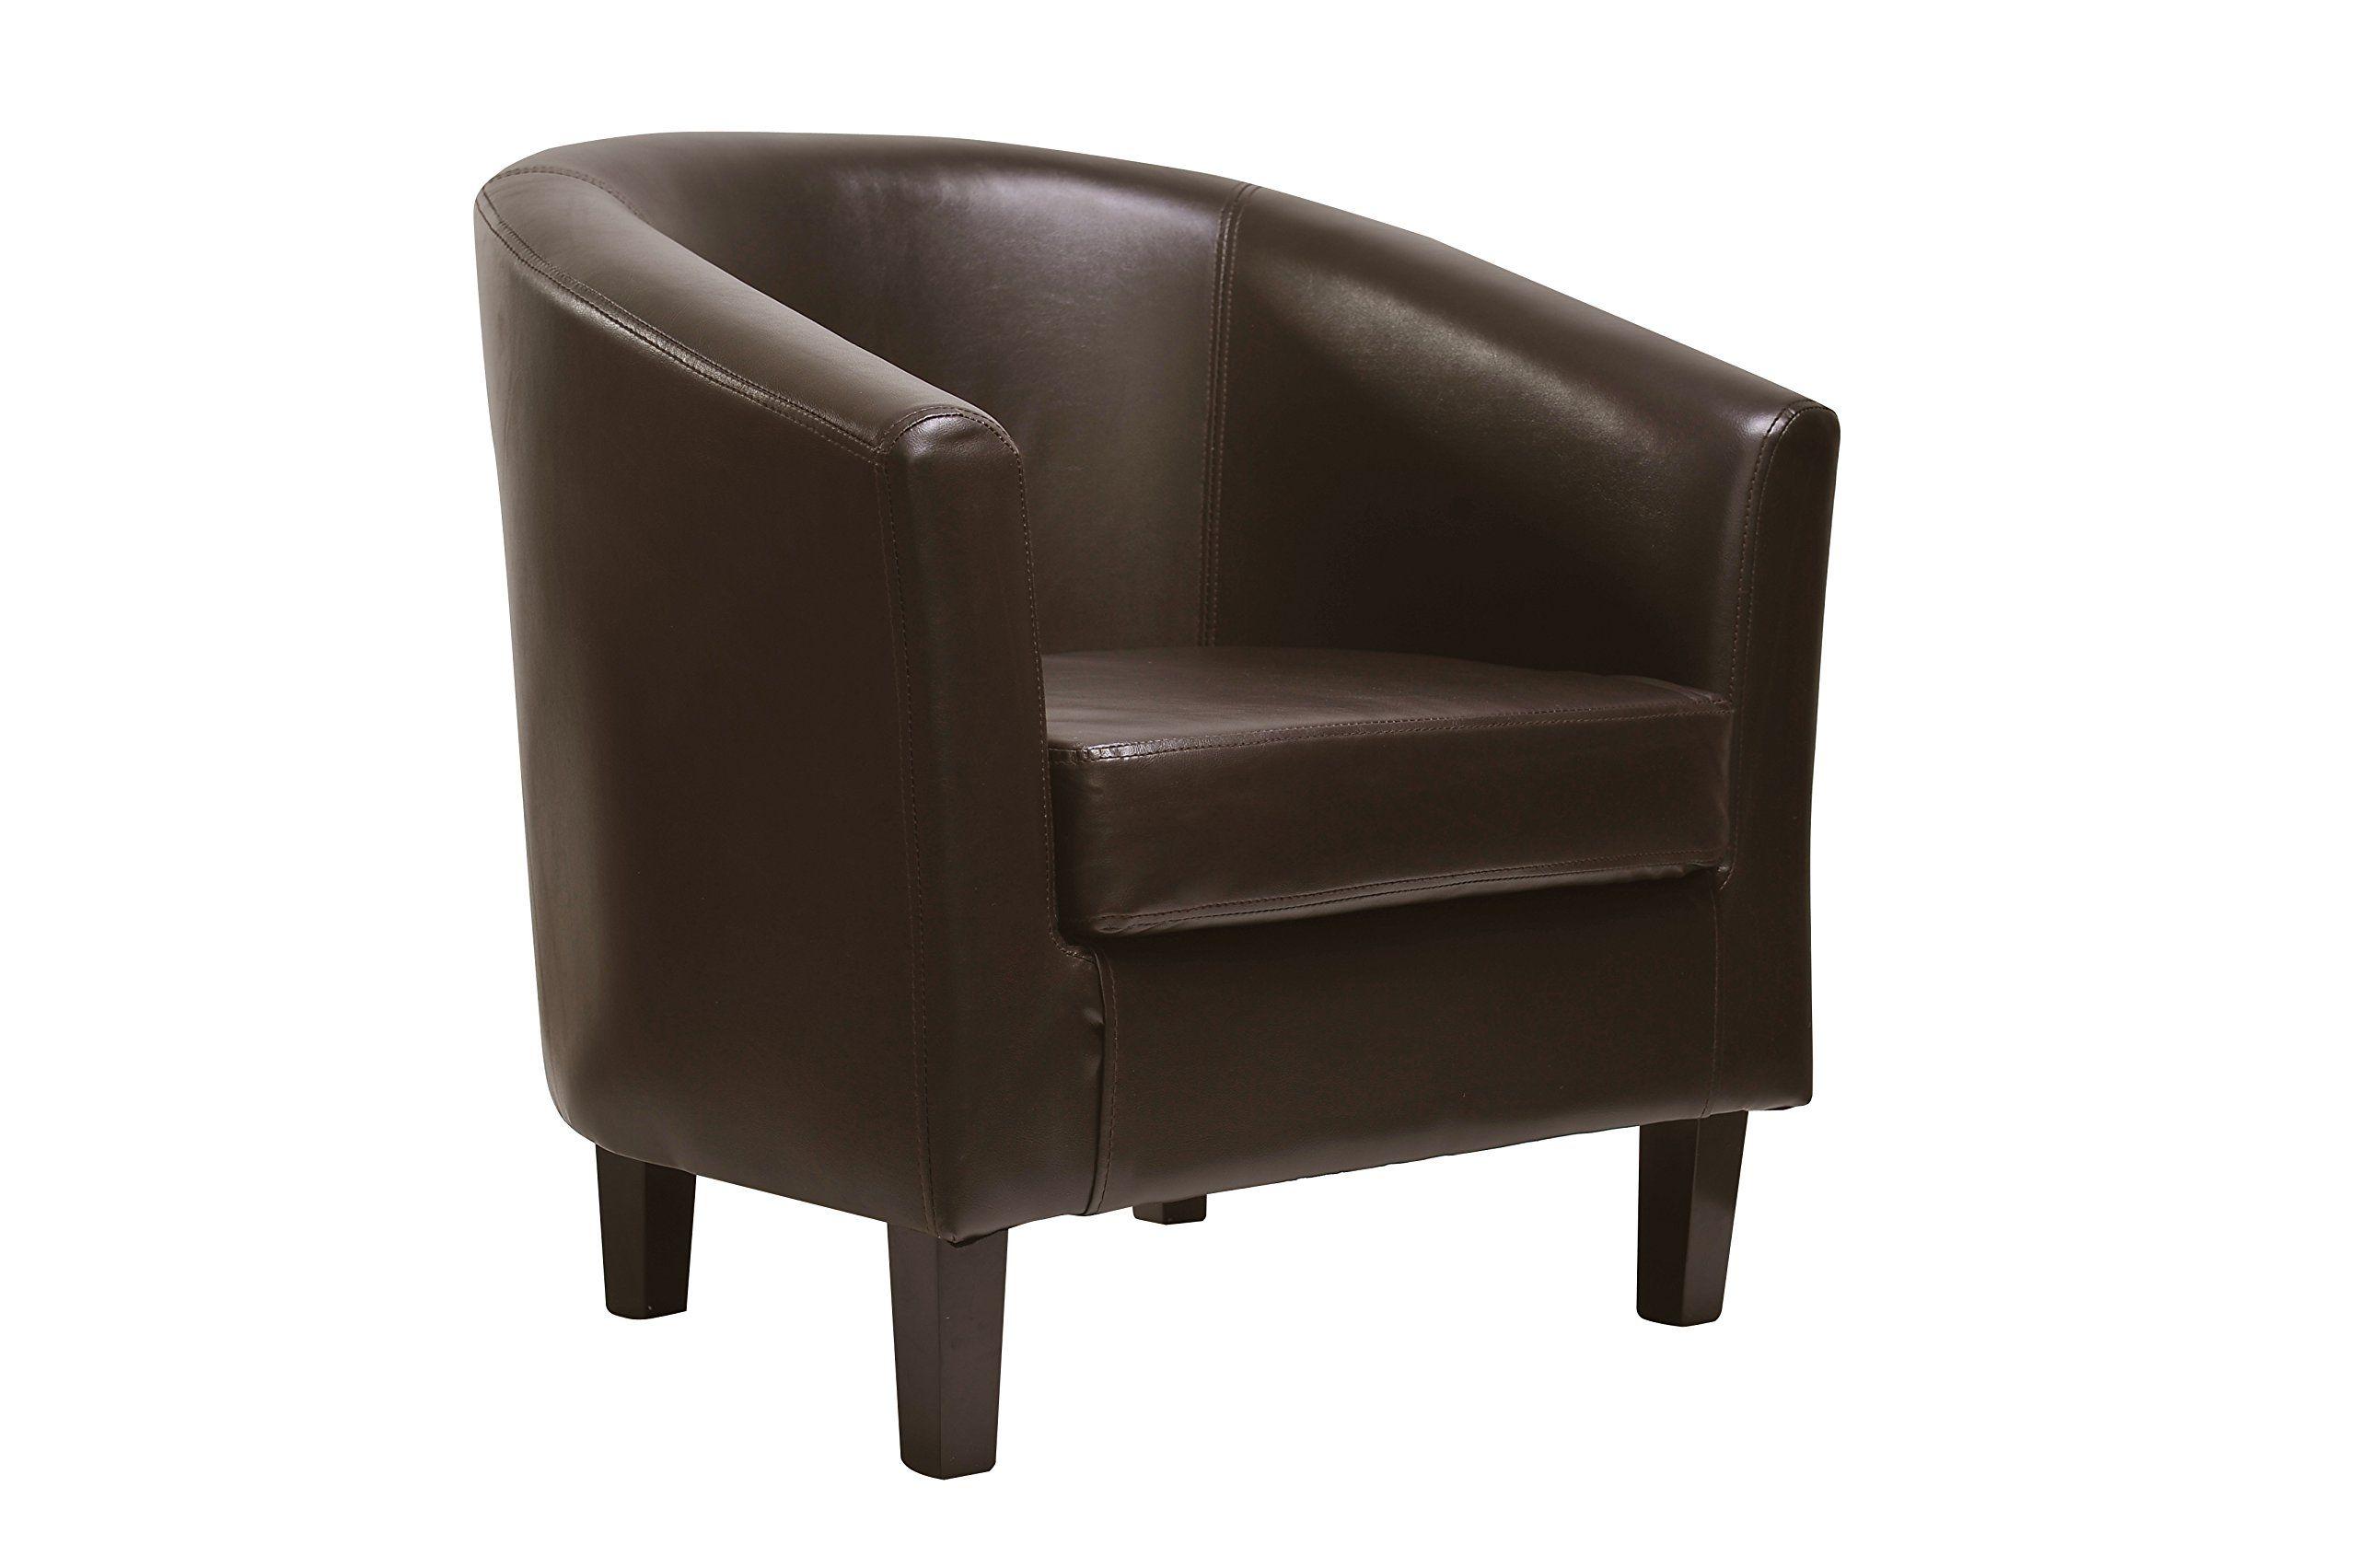 Mcc Sessel Clubsessel Lounge Clubsessel Sessel Hausmöbel